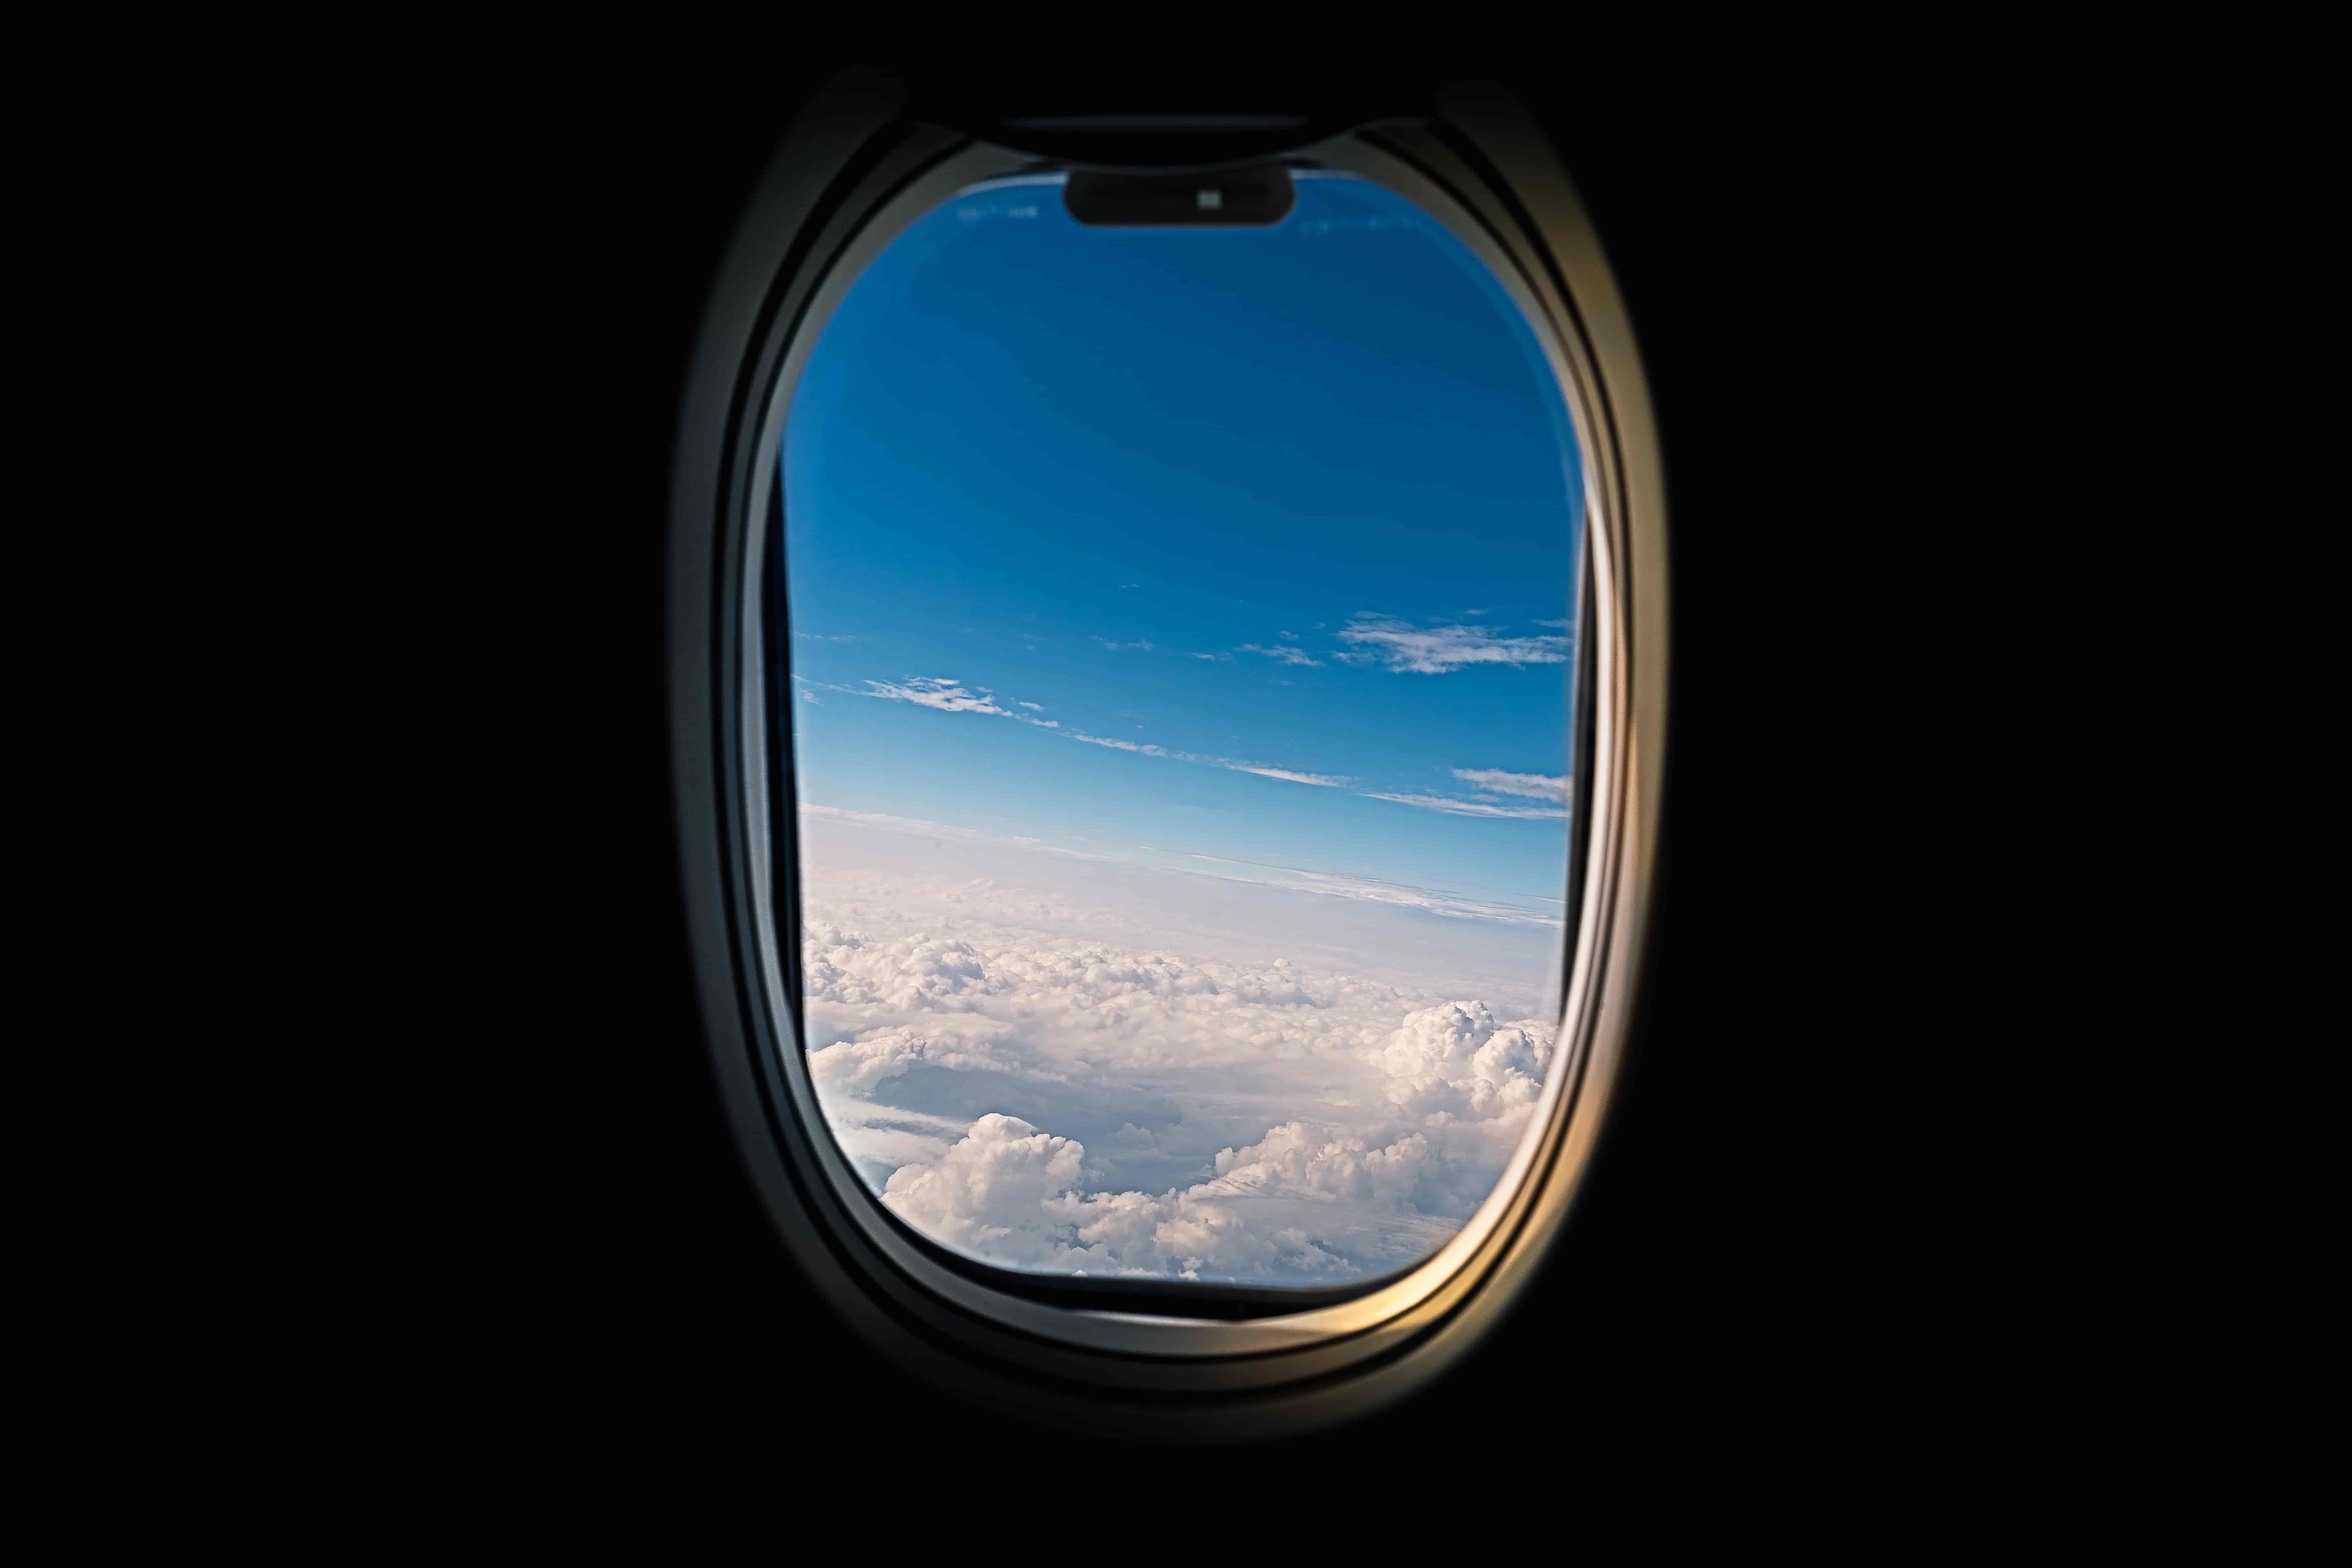 Okarito, la seule agence de voyage pro à croitre en 2020 ?